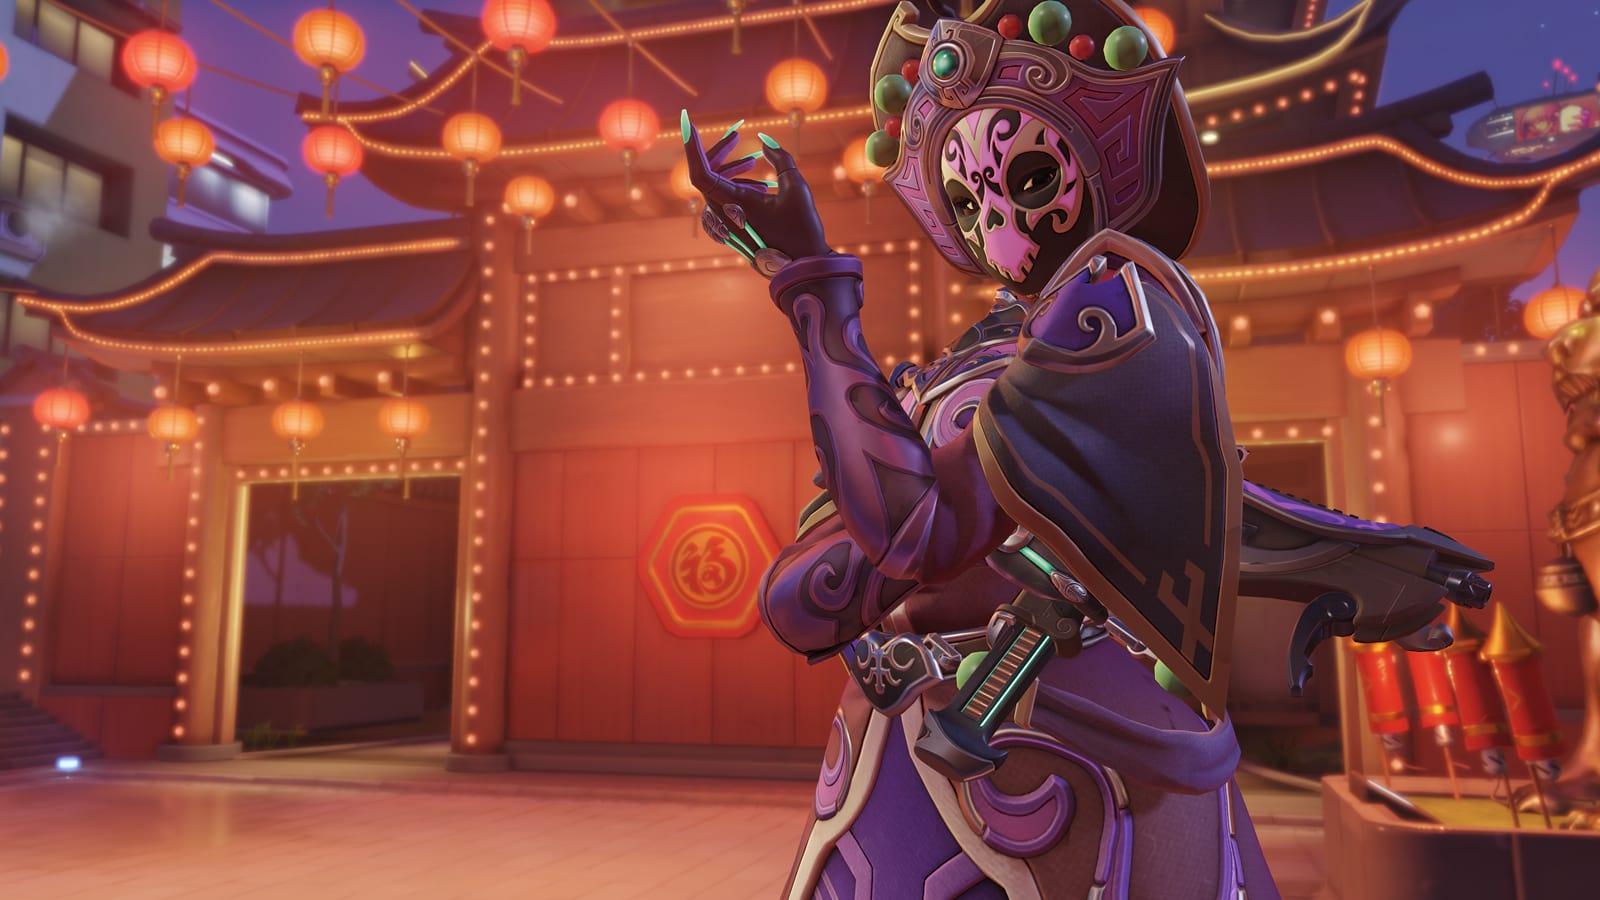 Sombra Face Changer Overwatch skin